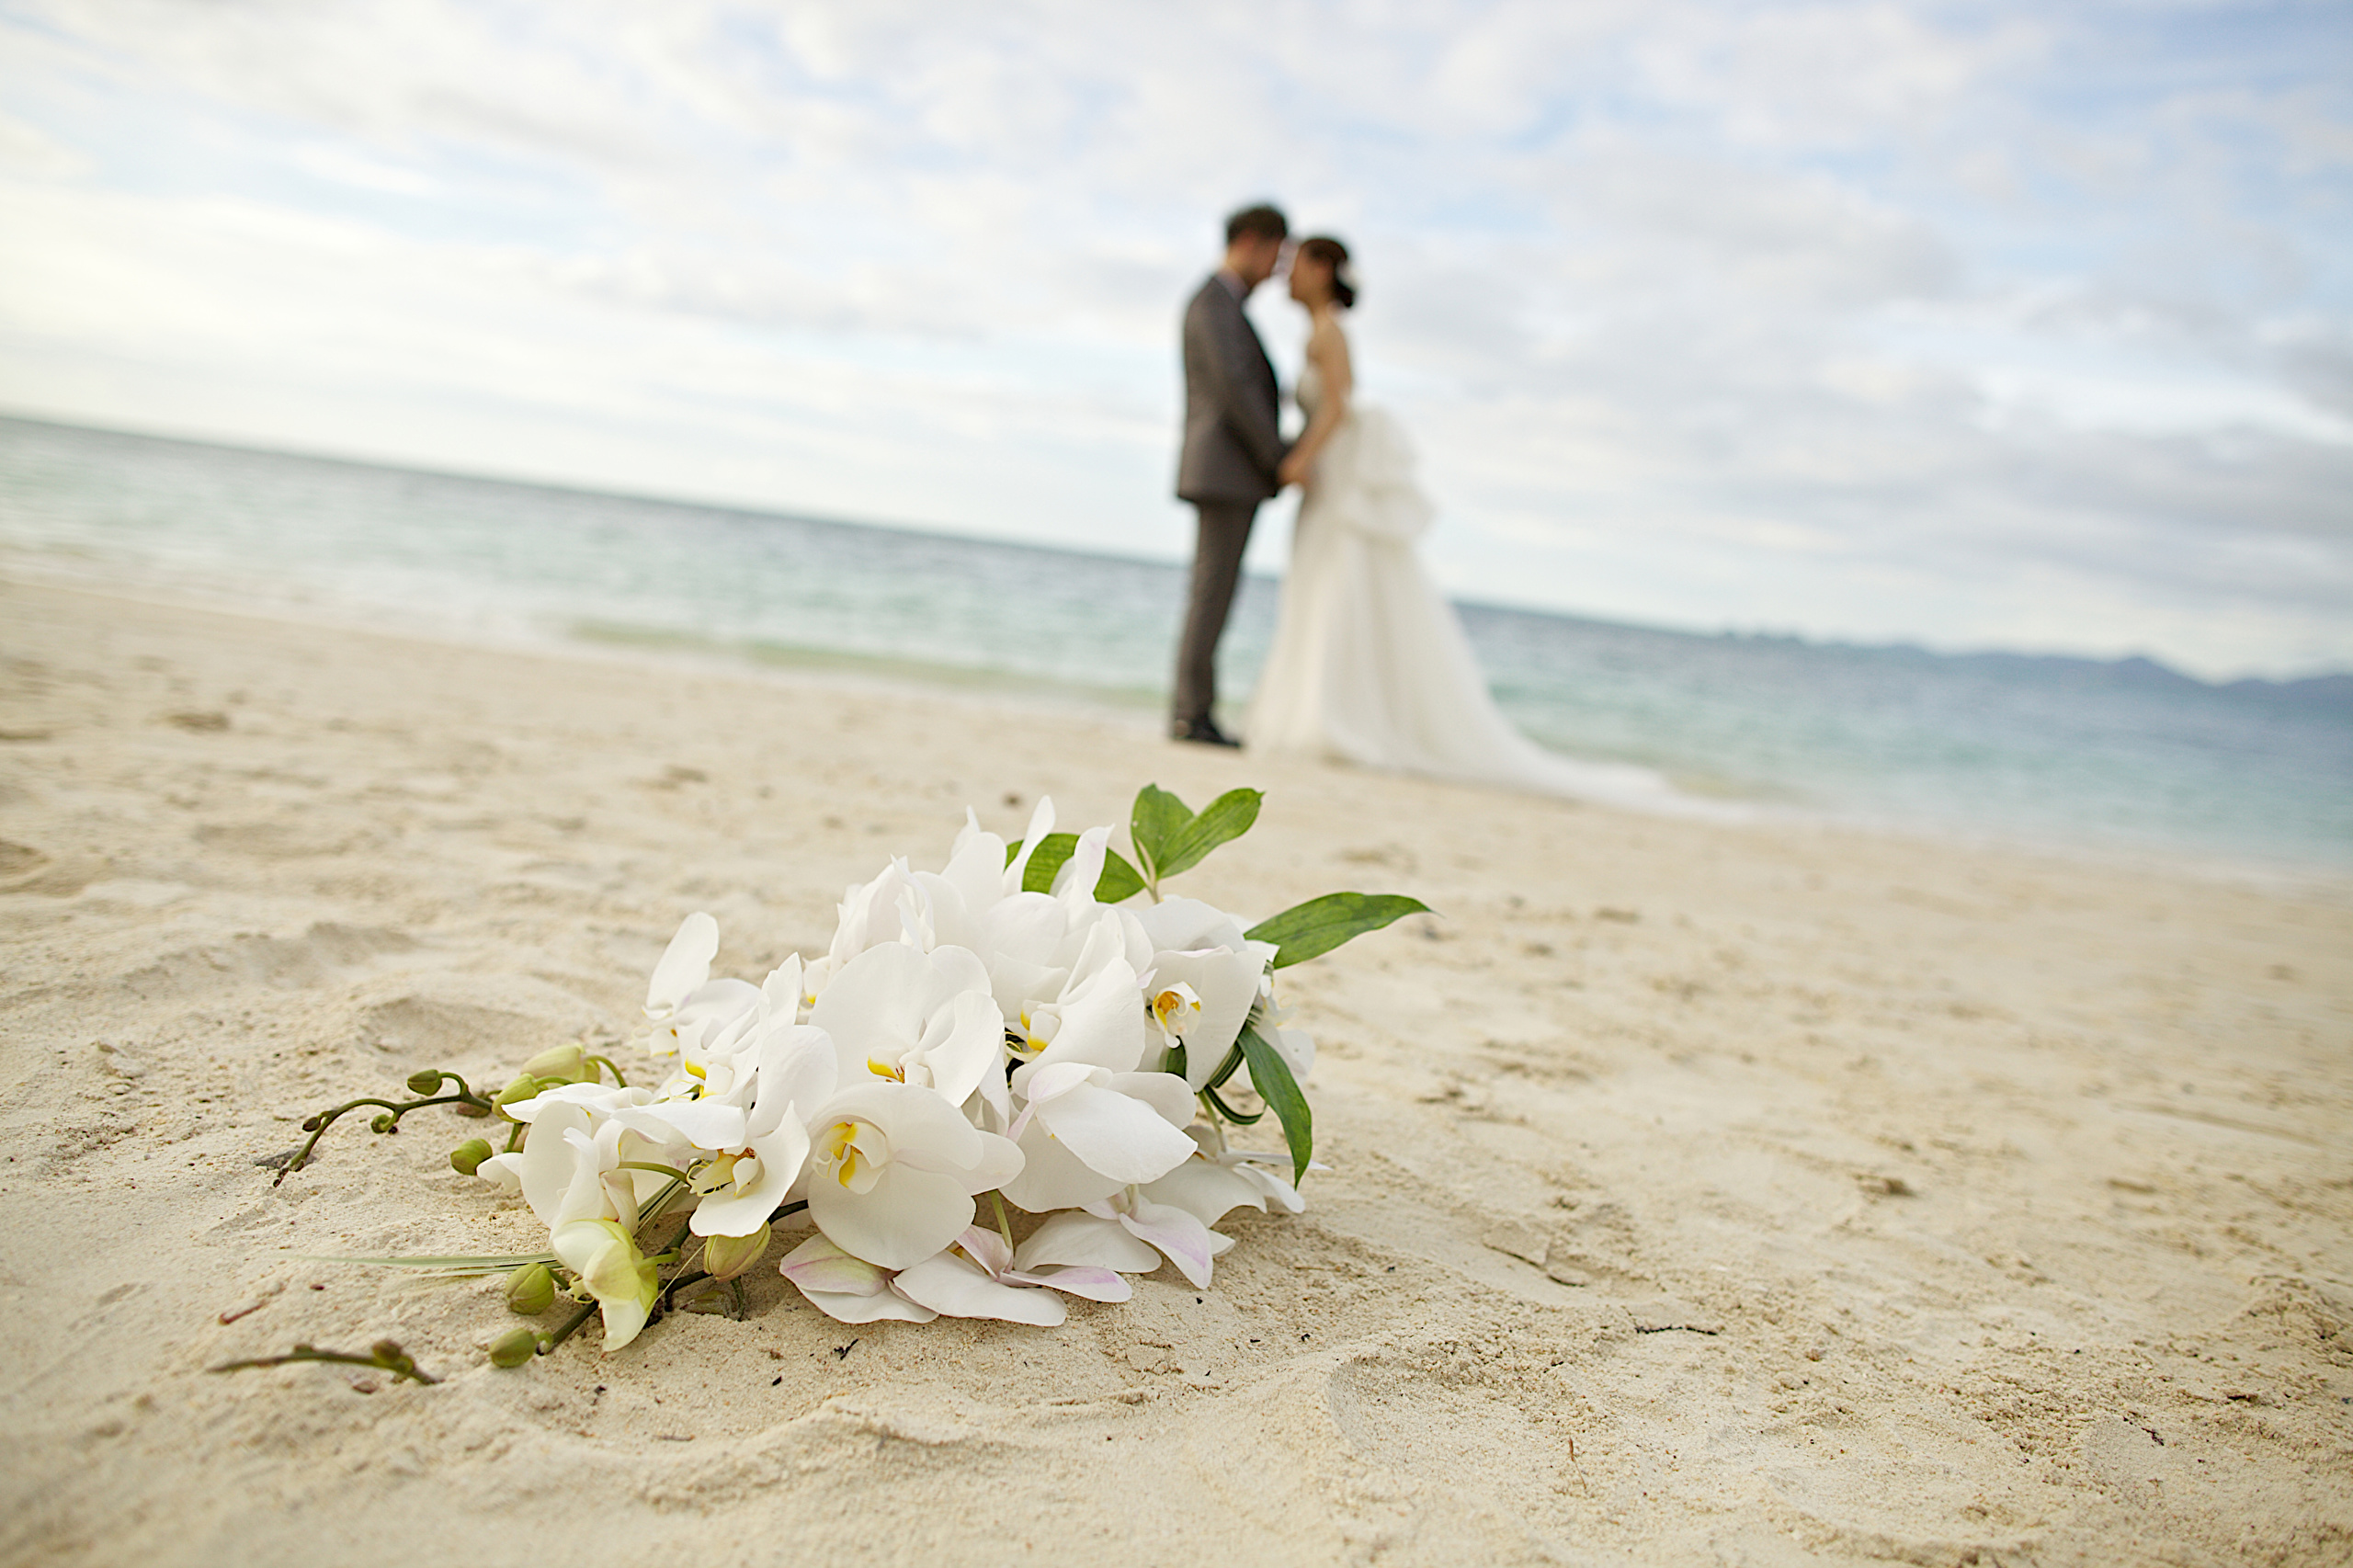 влюбленная пара на берегу